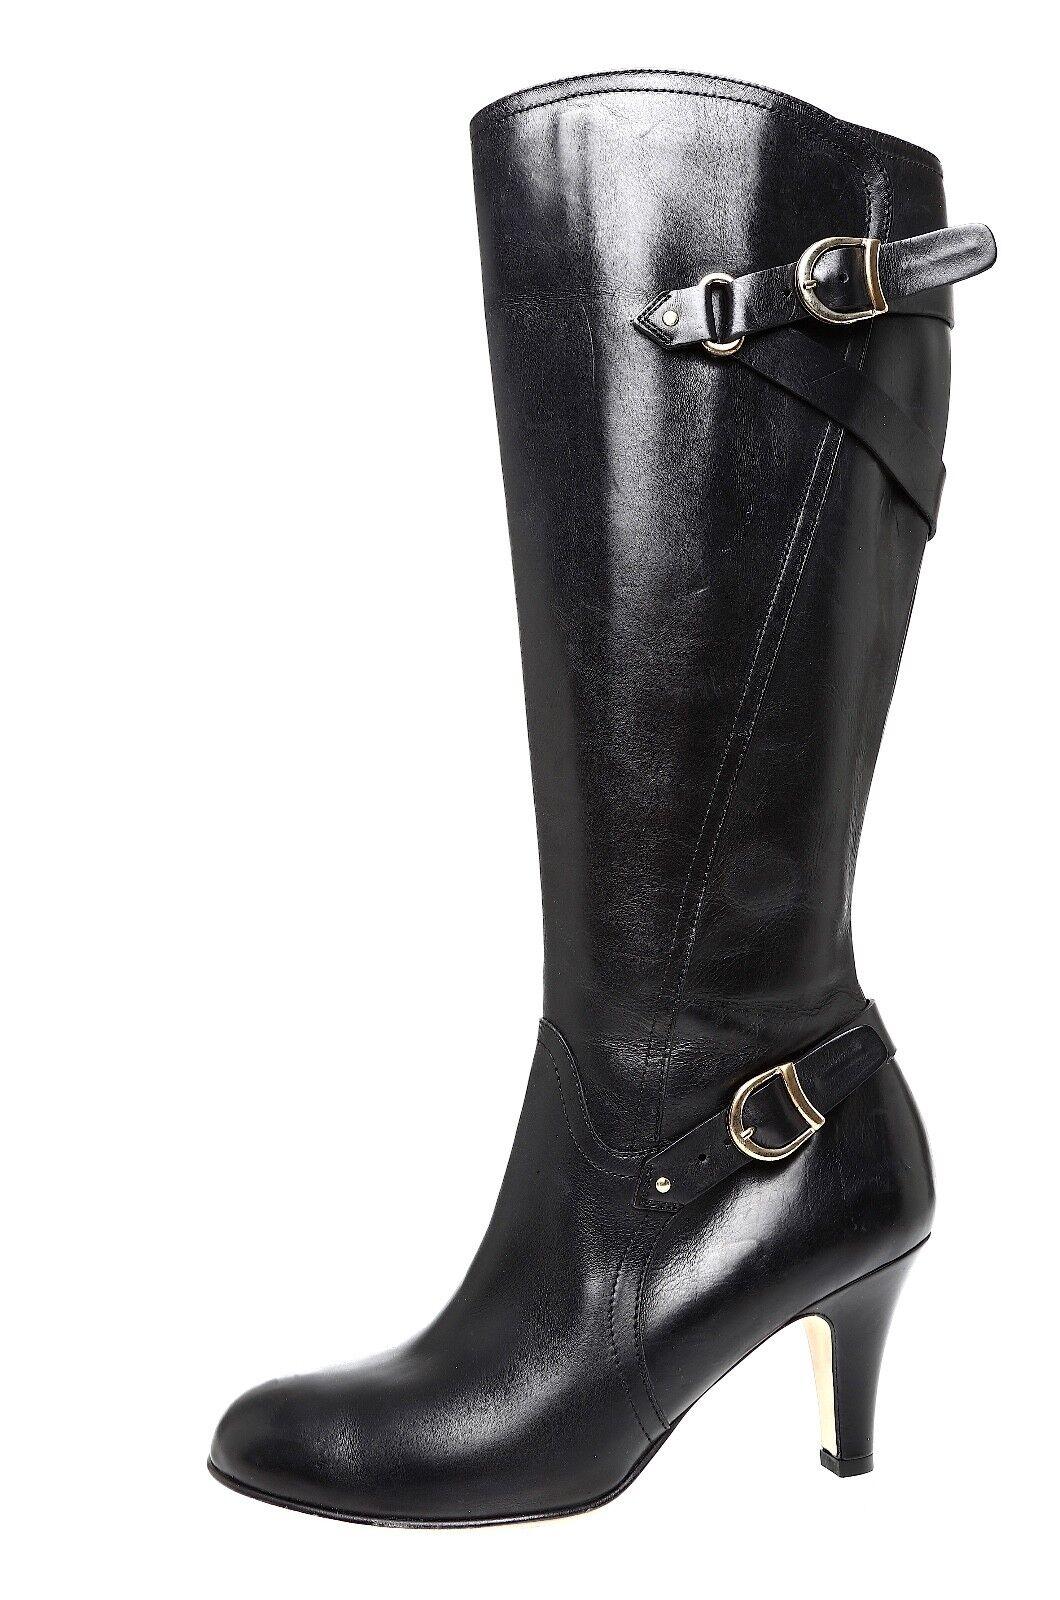 Anyi Lu Viktoria Leather Boot Black Women Sz 39 *